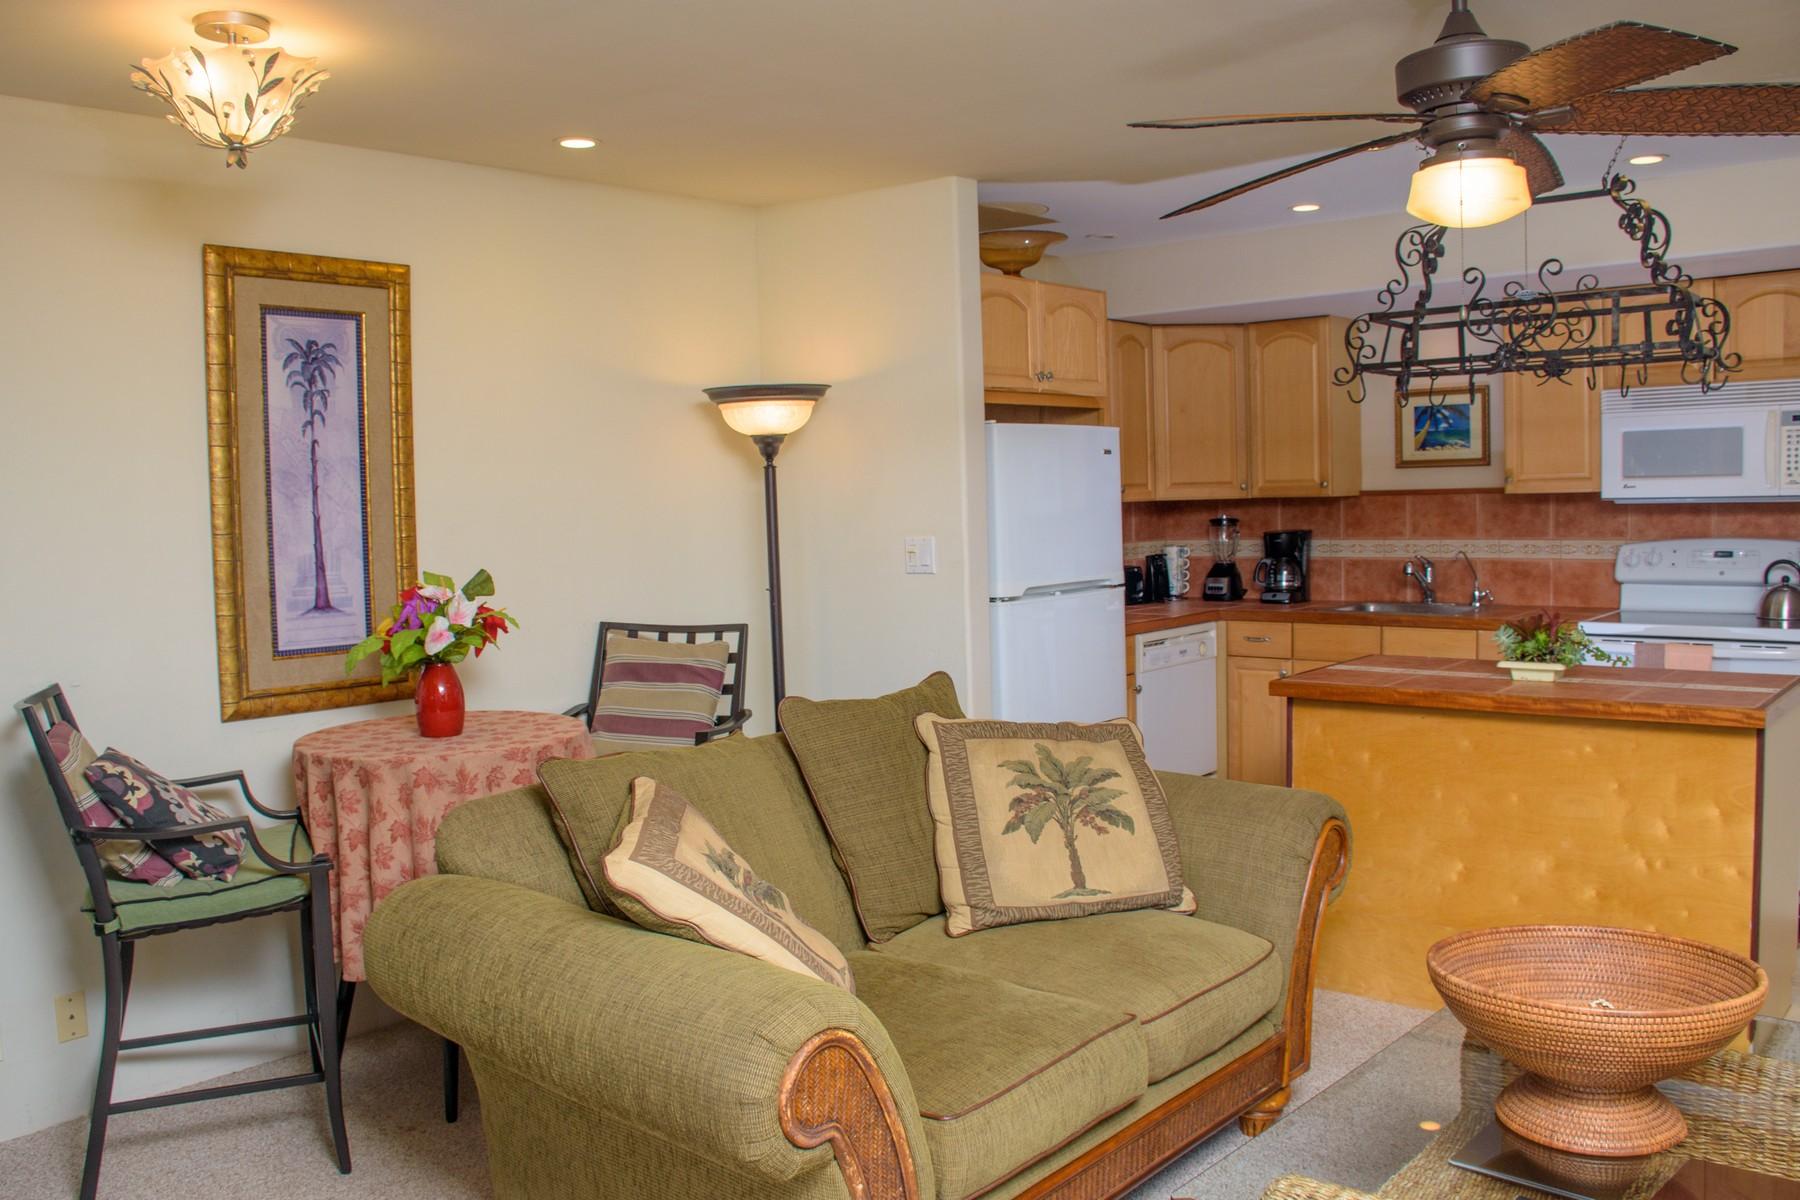 Condominiums for Active at The Tree House at Maui Sands Seaside 3559 Lower Honoapiilani Road, Maui Sands #720 Honokowai, Hawaii 96761 United States